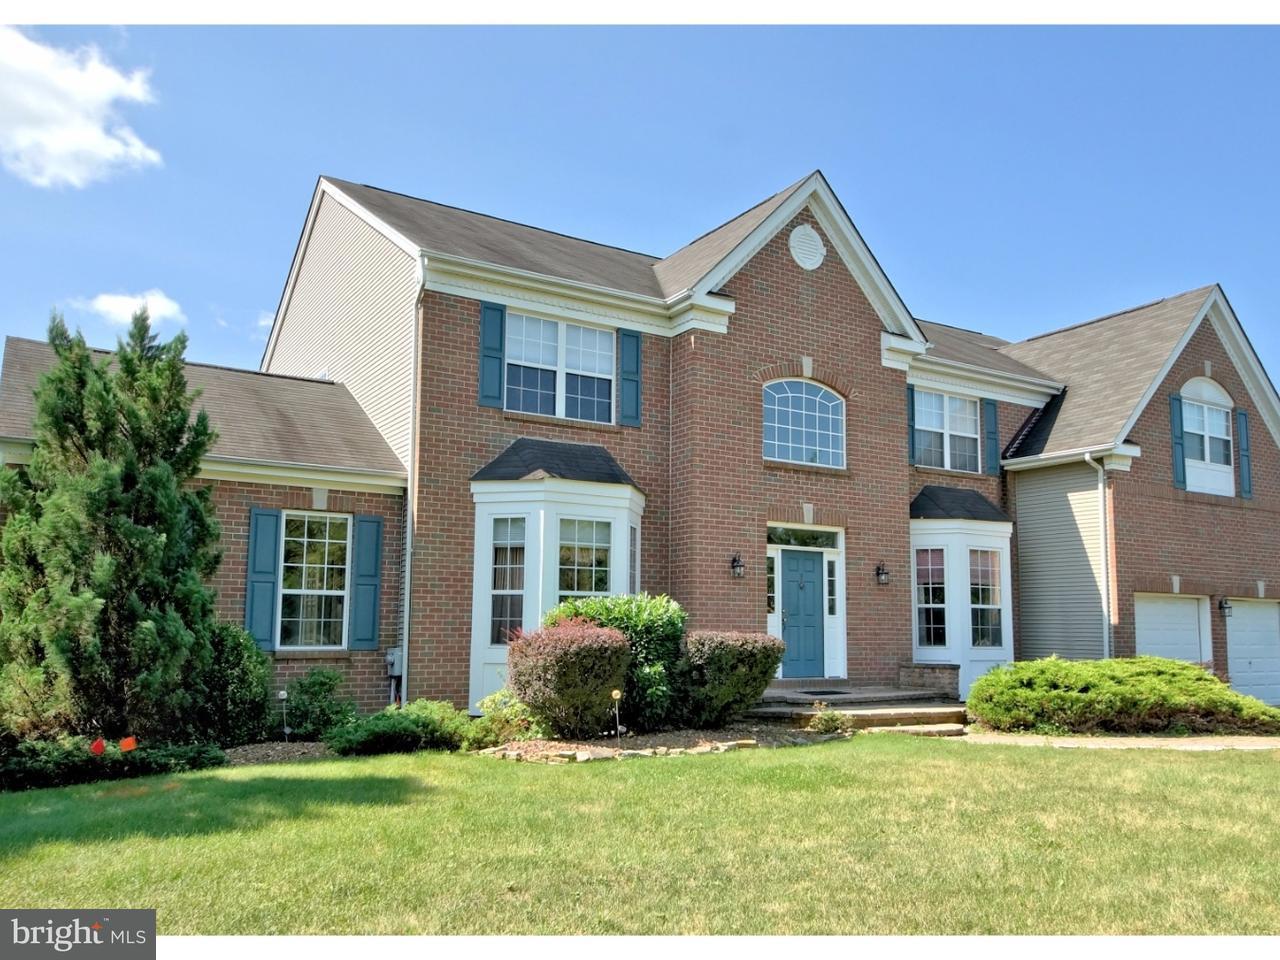 独户住宅 为 销售 在 3 CLIFFWOOD Drive Allentown, 新泽西州 08501 美国在/周边: Upper Freehold Township